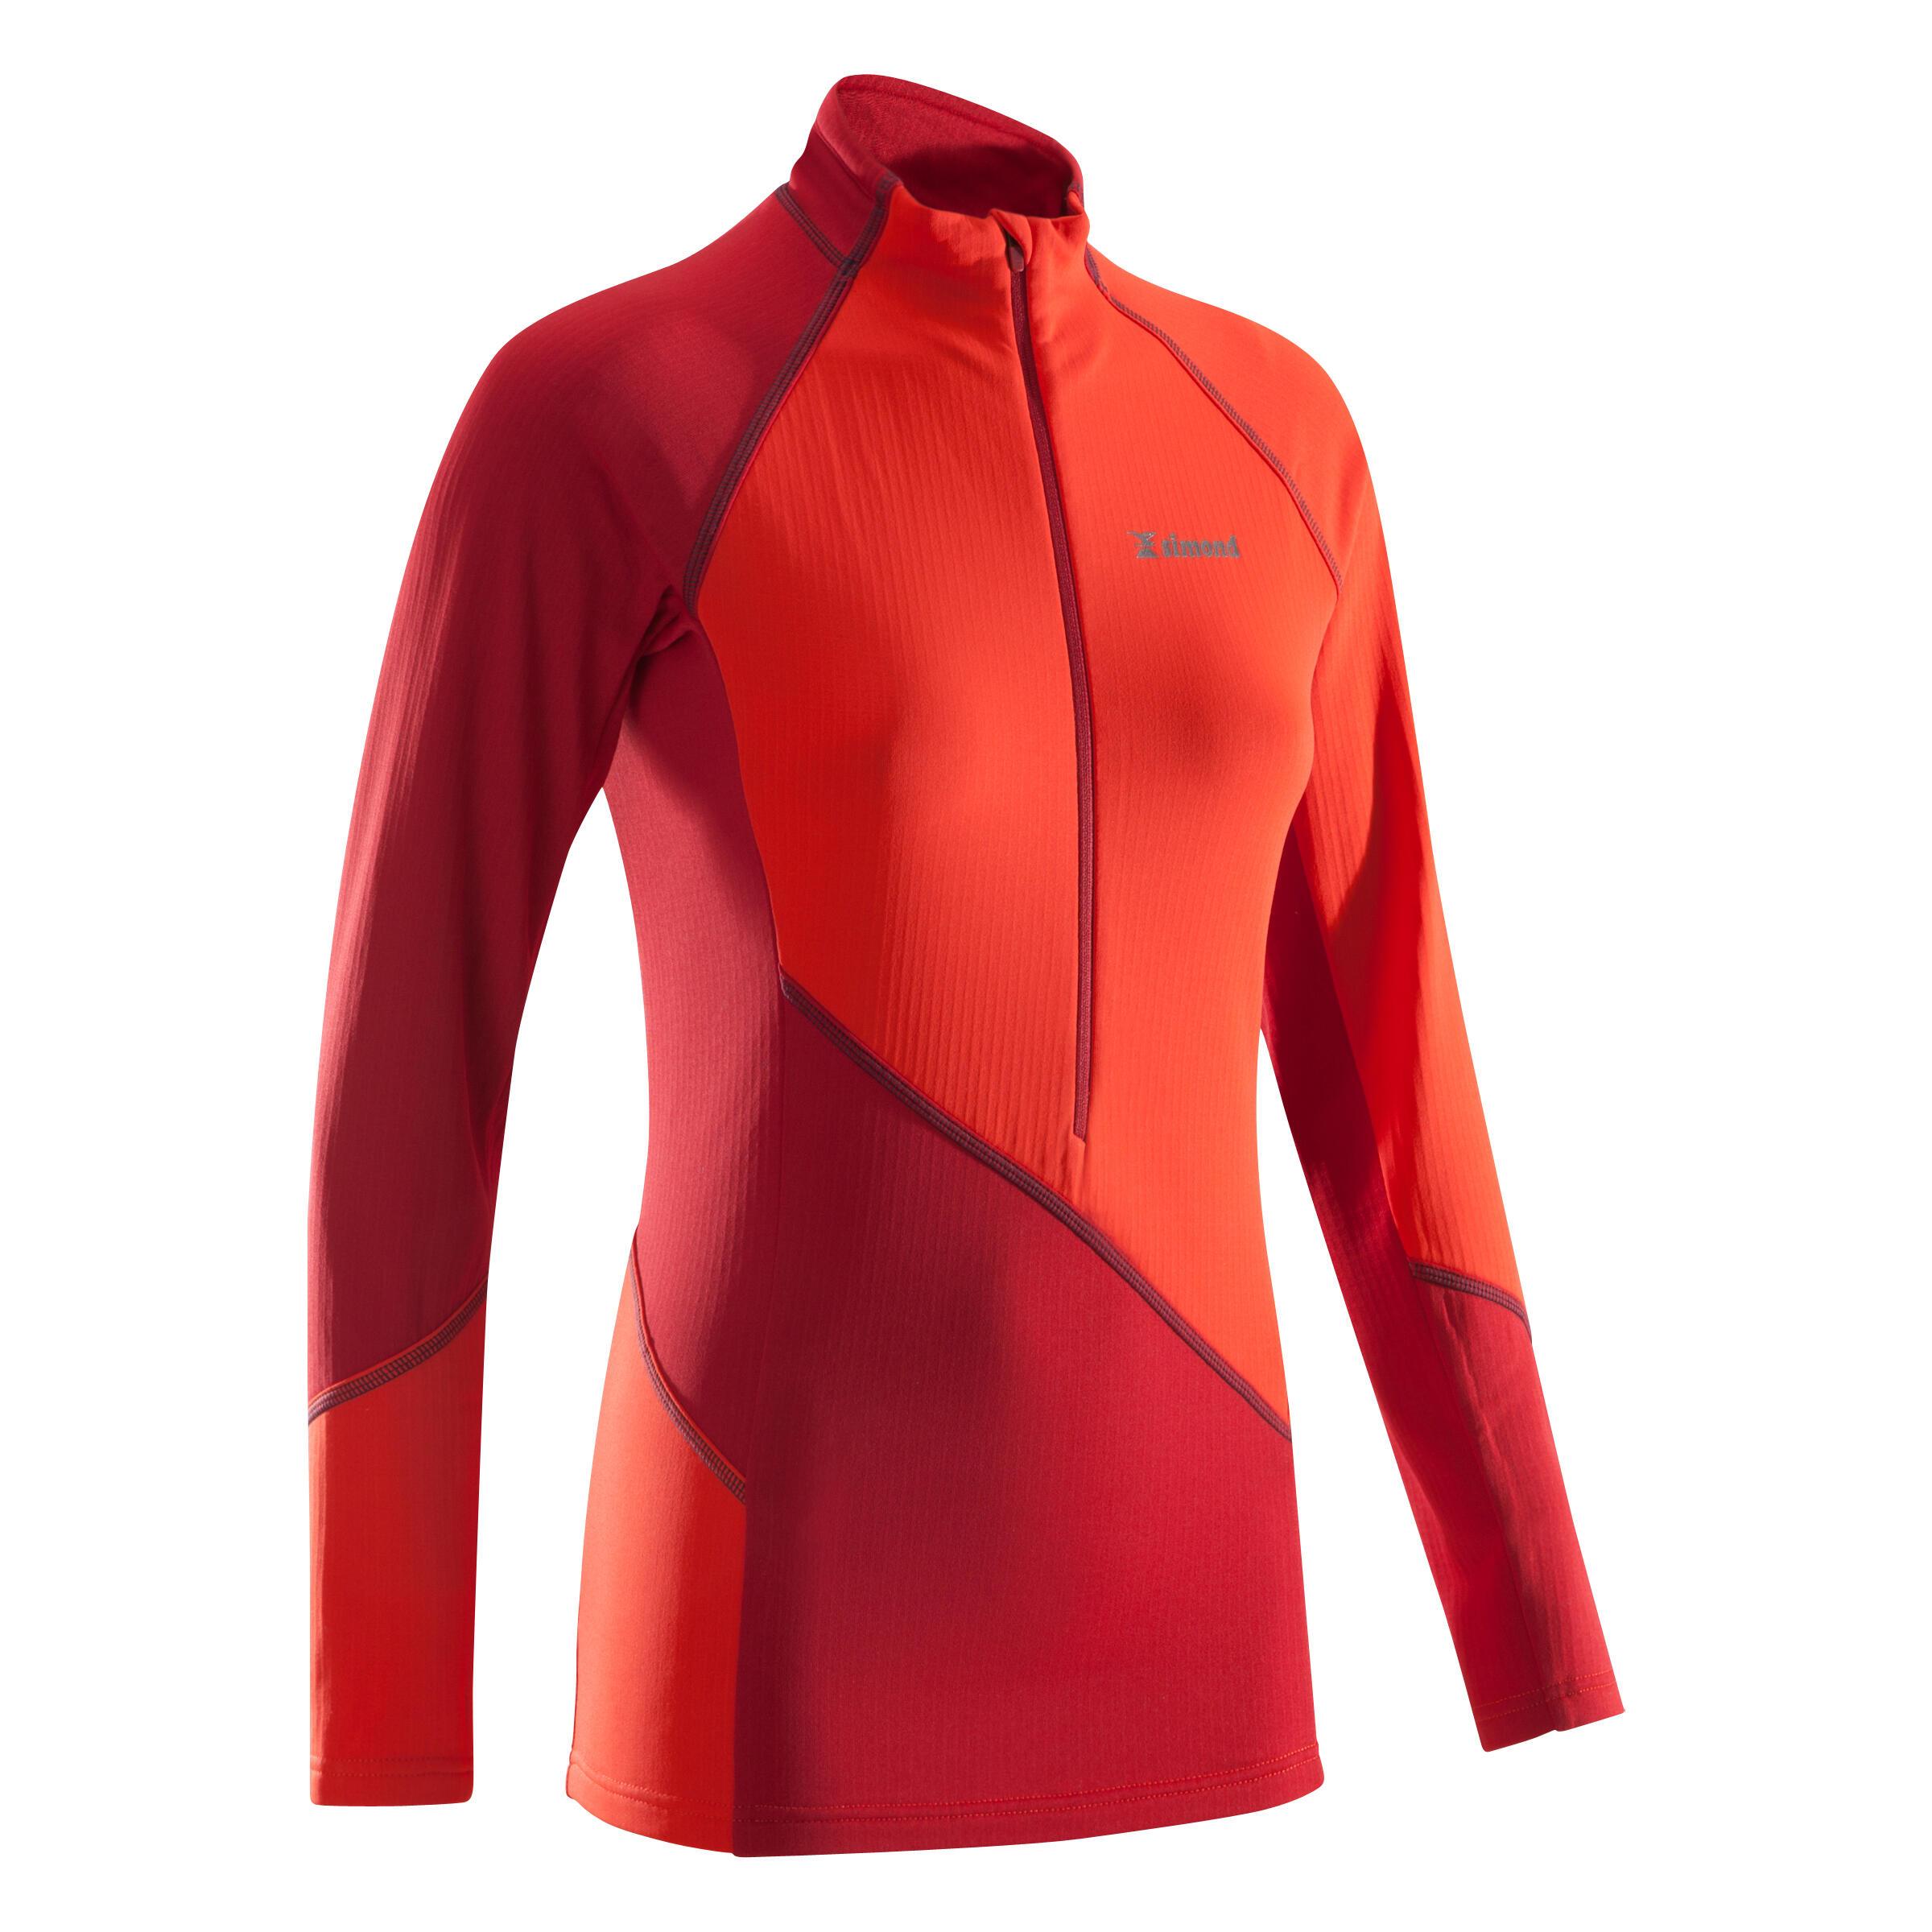 Klettershirt langarm Alpinism Damen rot/zinnoberrot   Sportbekleidung > Sportshirts > Klettershirts   Simond